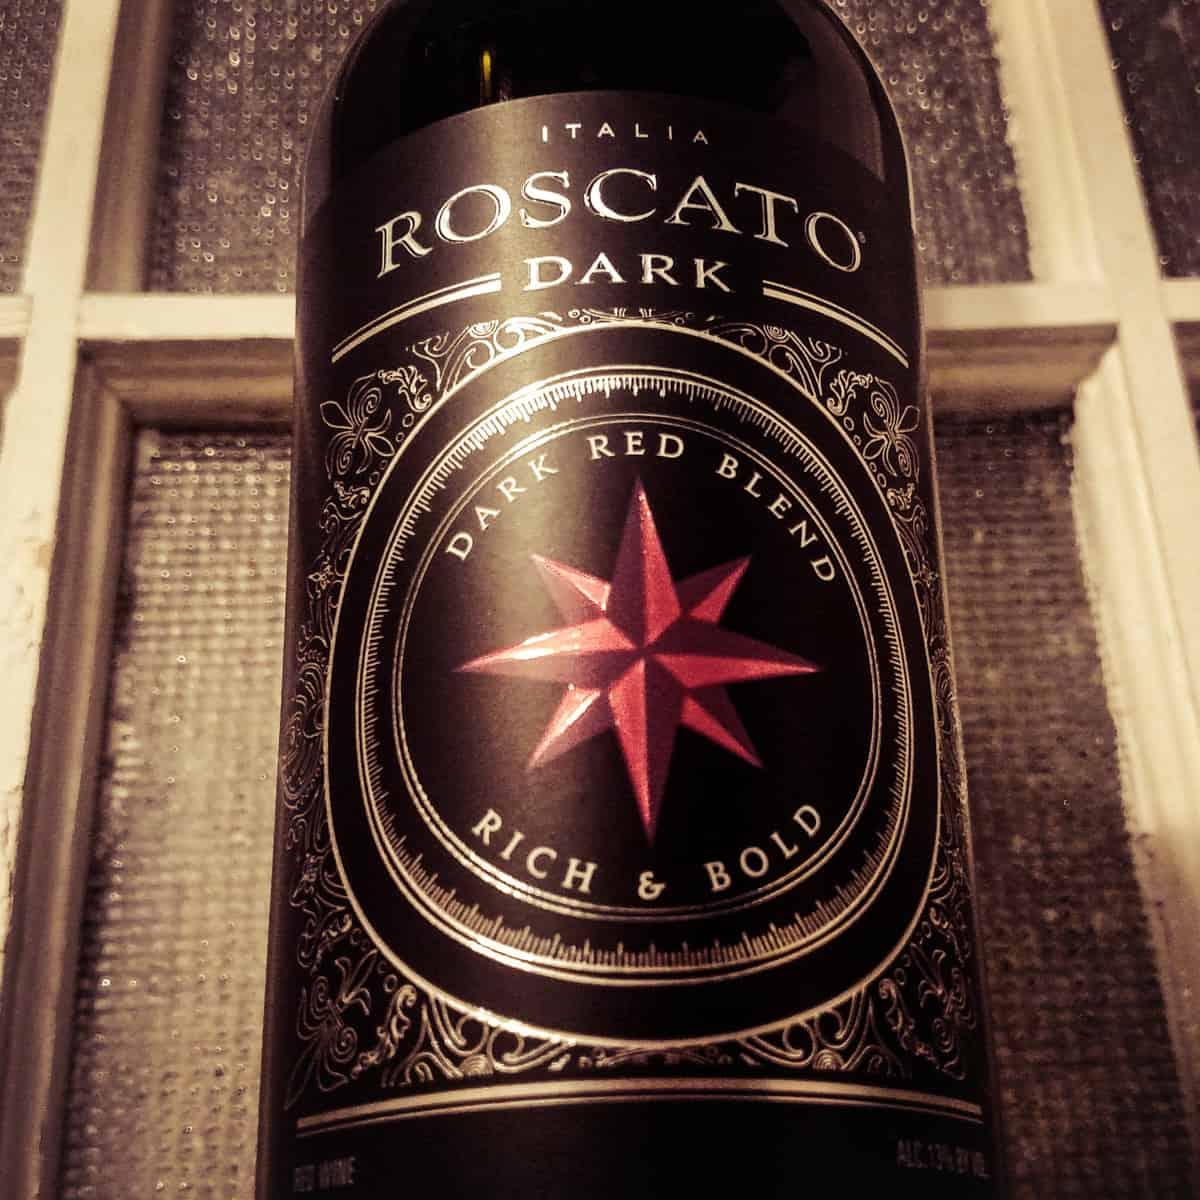 roscato-dark-dark-red-blend-trentino-italy-100